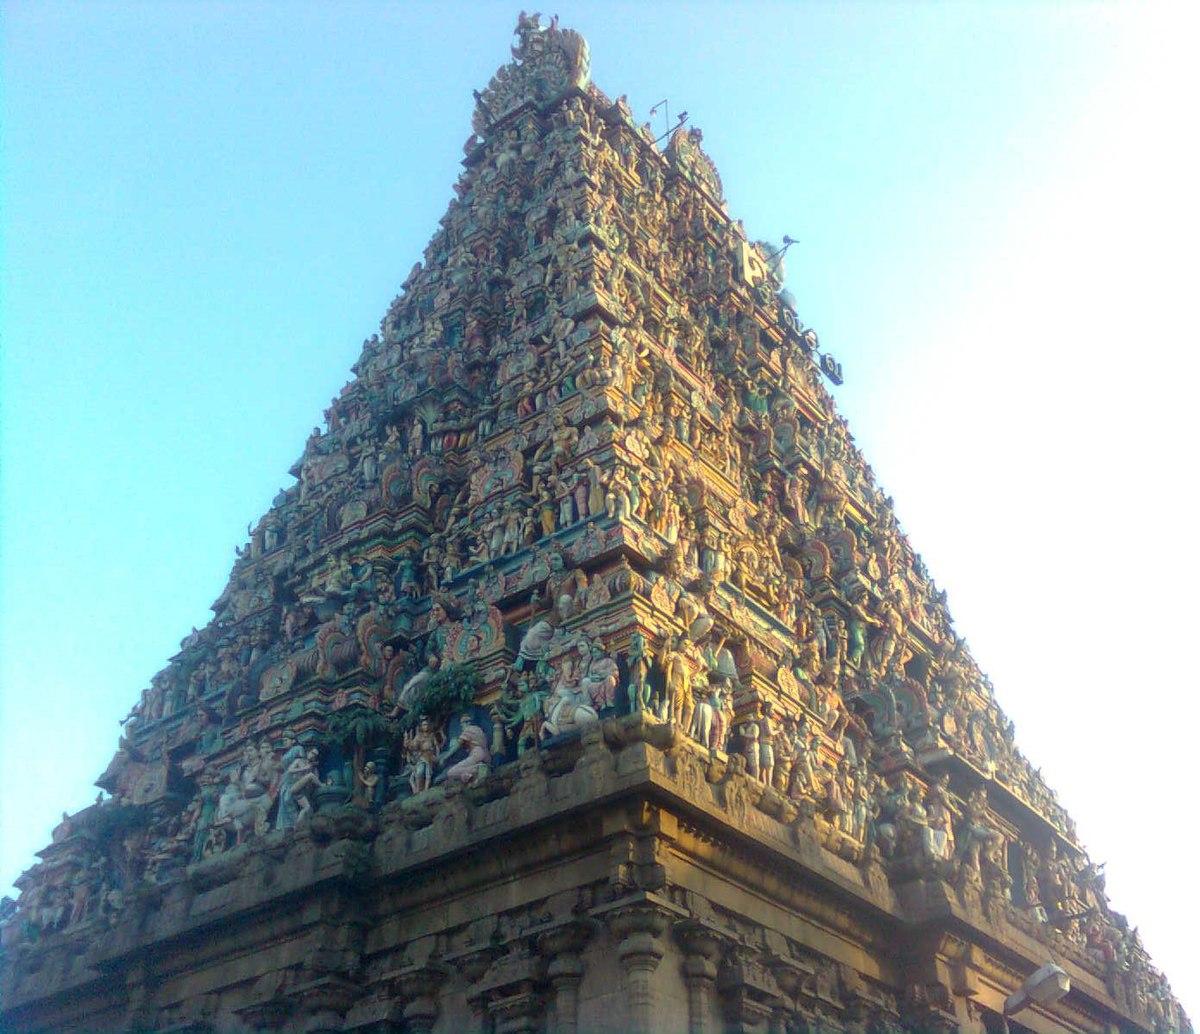 File:Dravidian architectural style gopuram kapaleeshwar temple.jpg - Wikimedia Commons